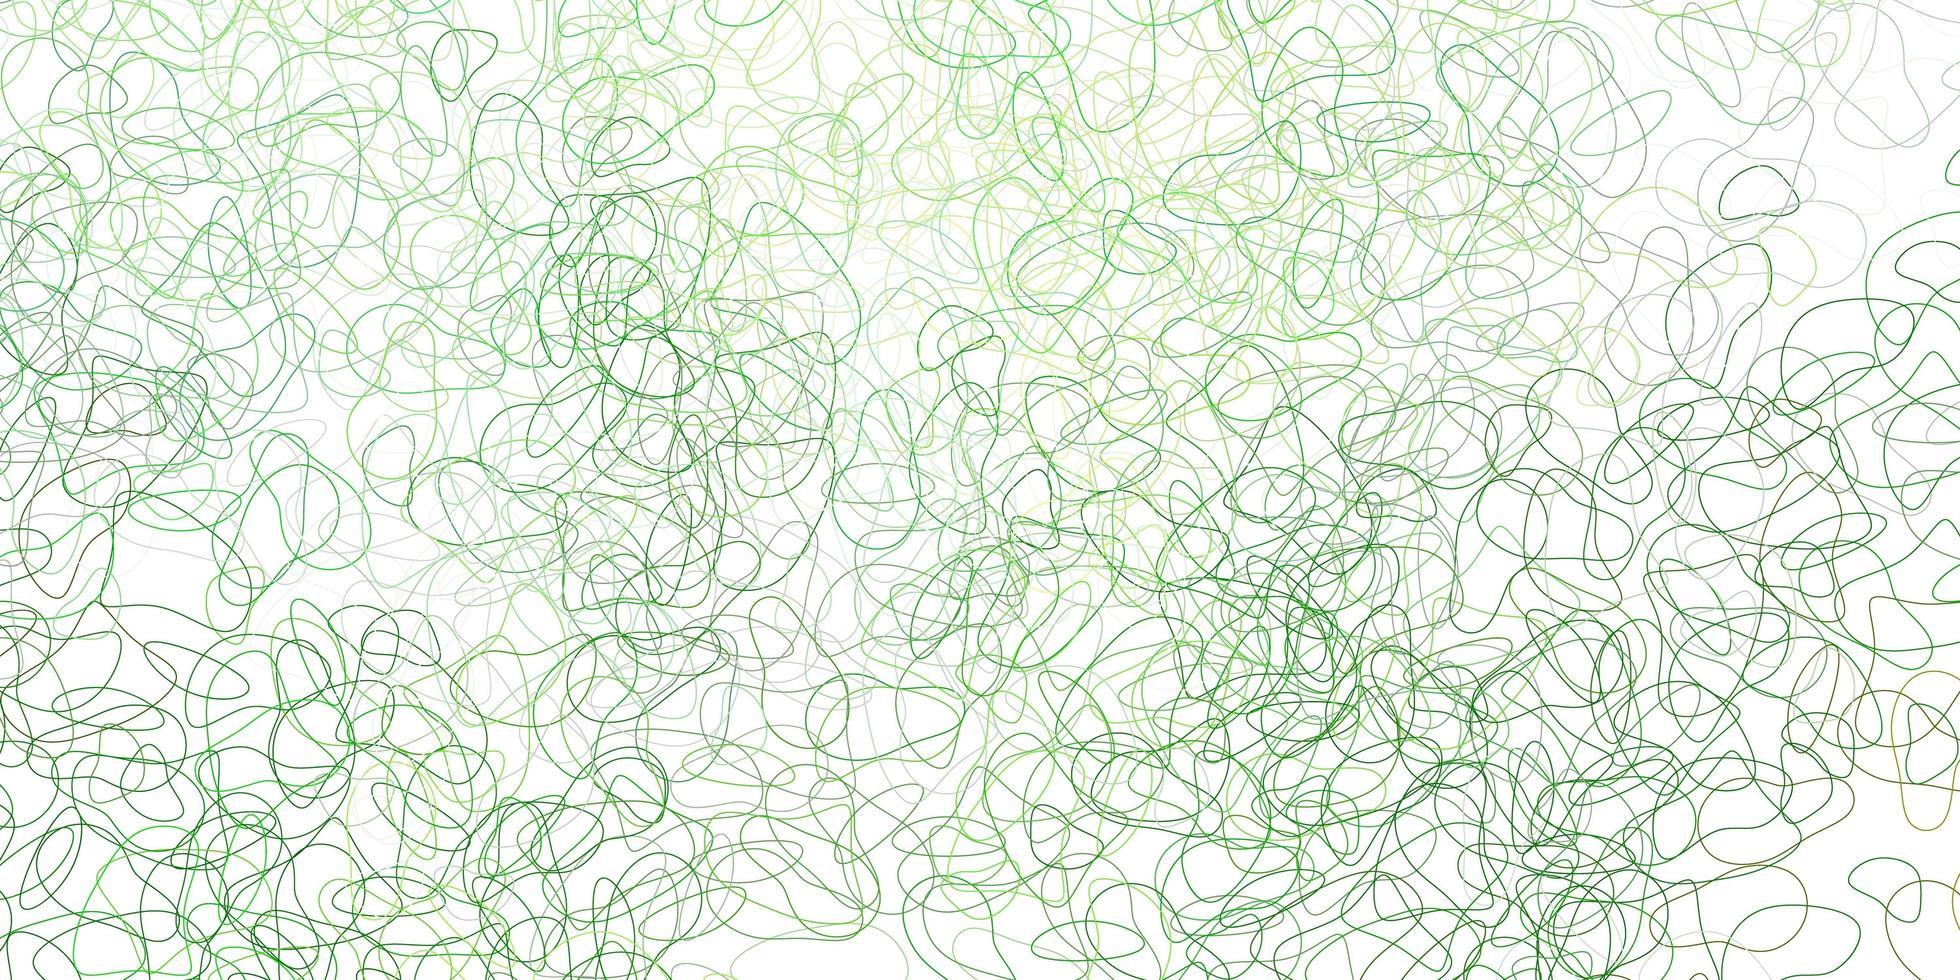 Fondo de vector verde claro, amarillo con formas caóticas.